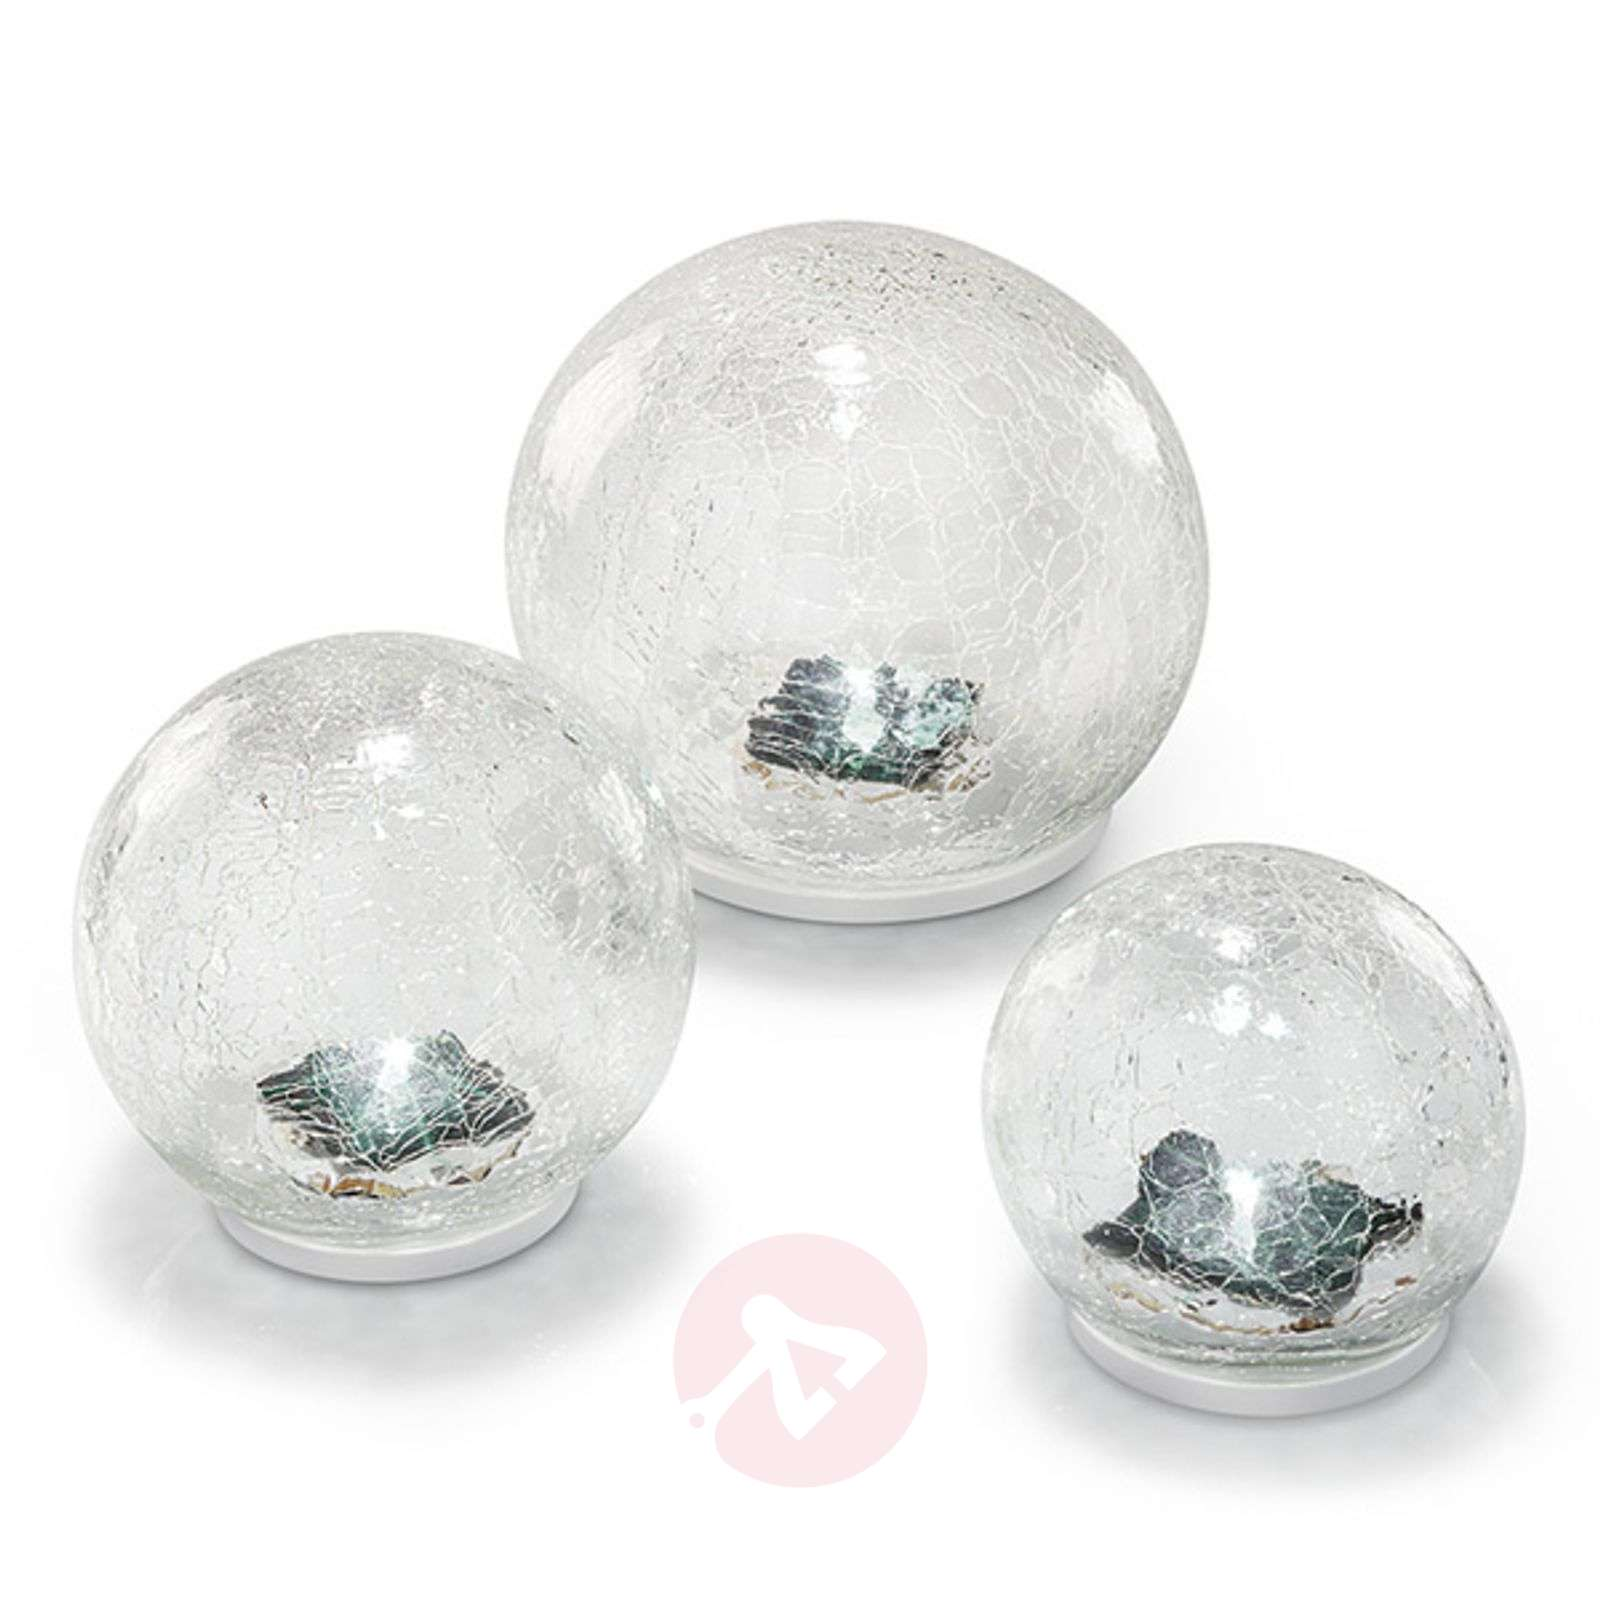 LED solar light set Crackle Ball, set of 3-3012538-01